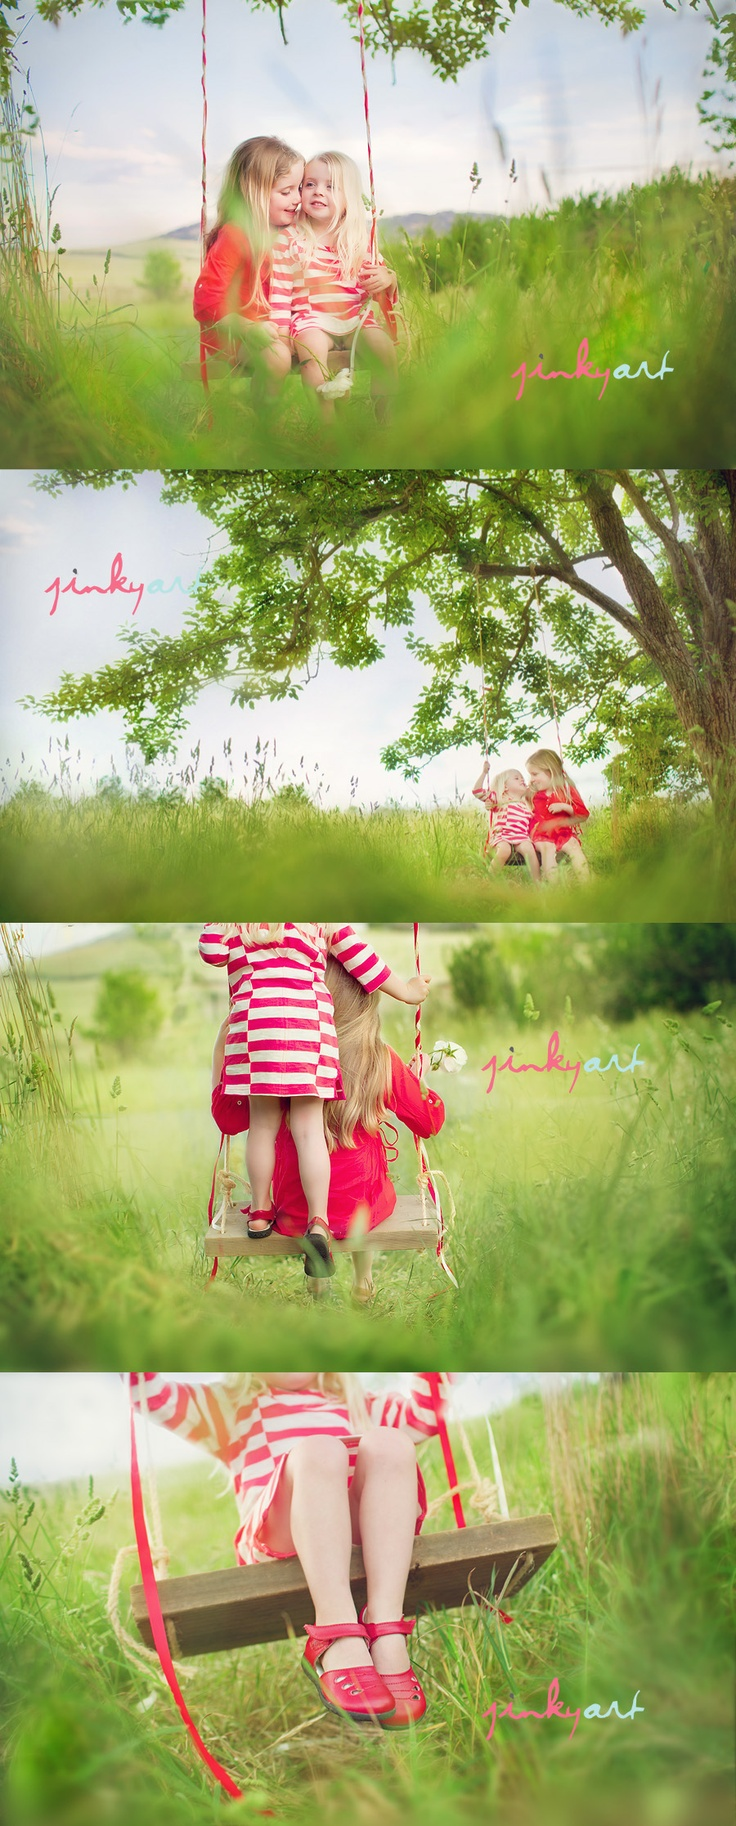 Barb Uil is soooo inspiring! BEAUTIFUL girls! Love. Red.